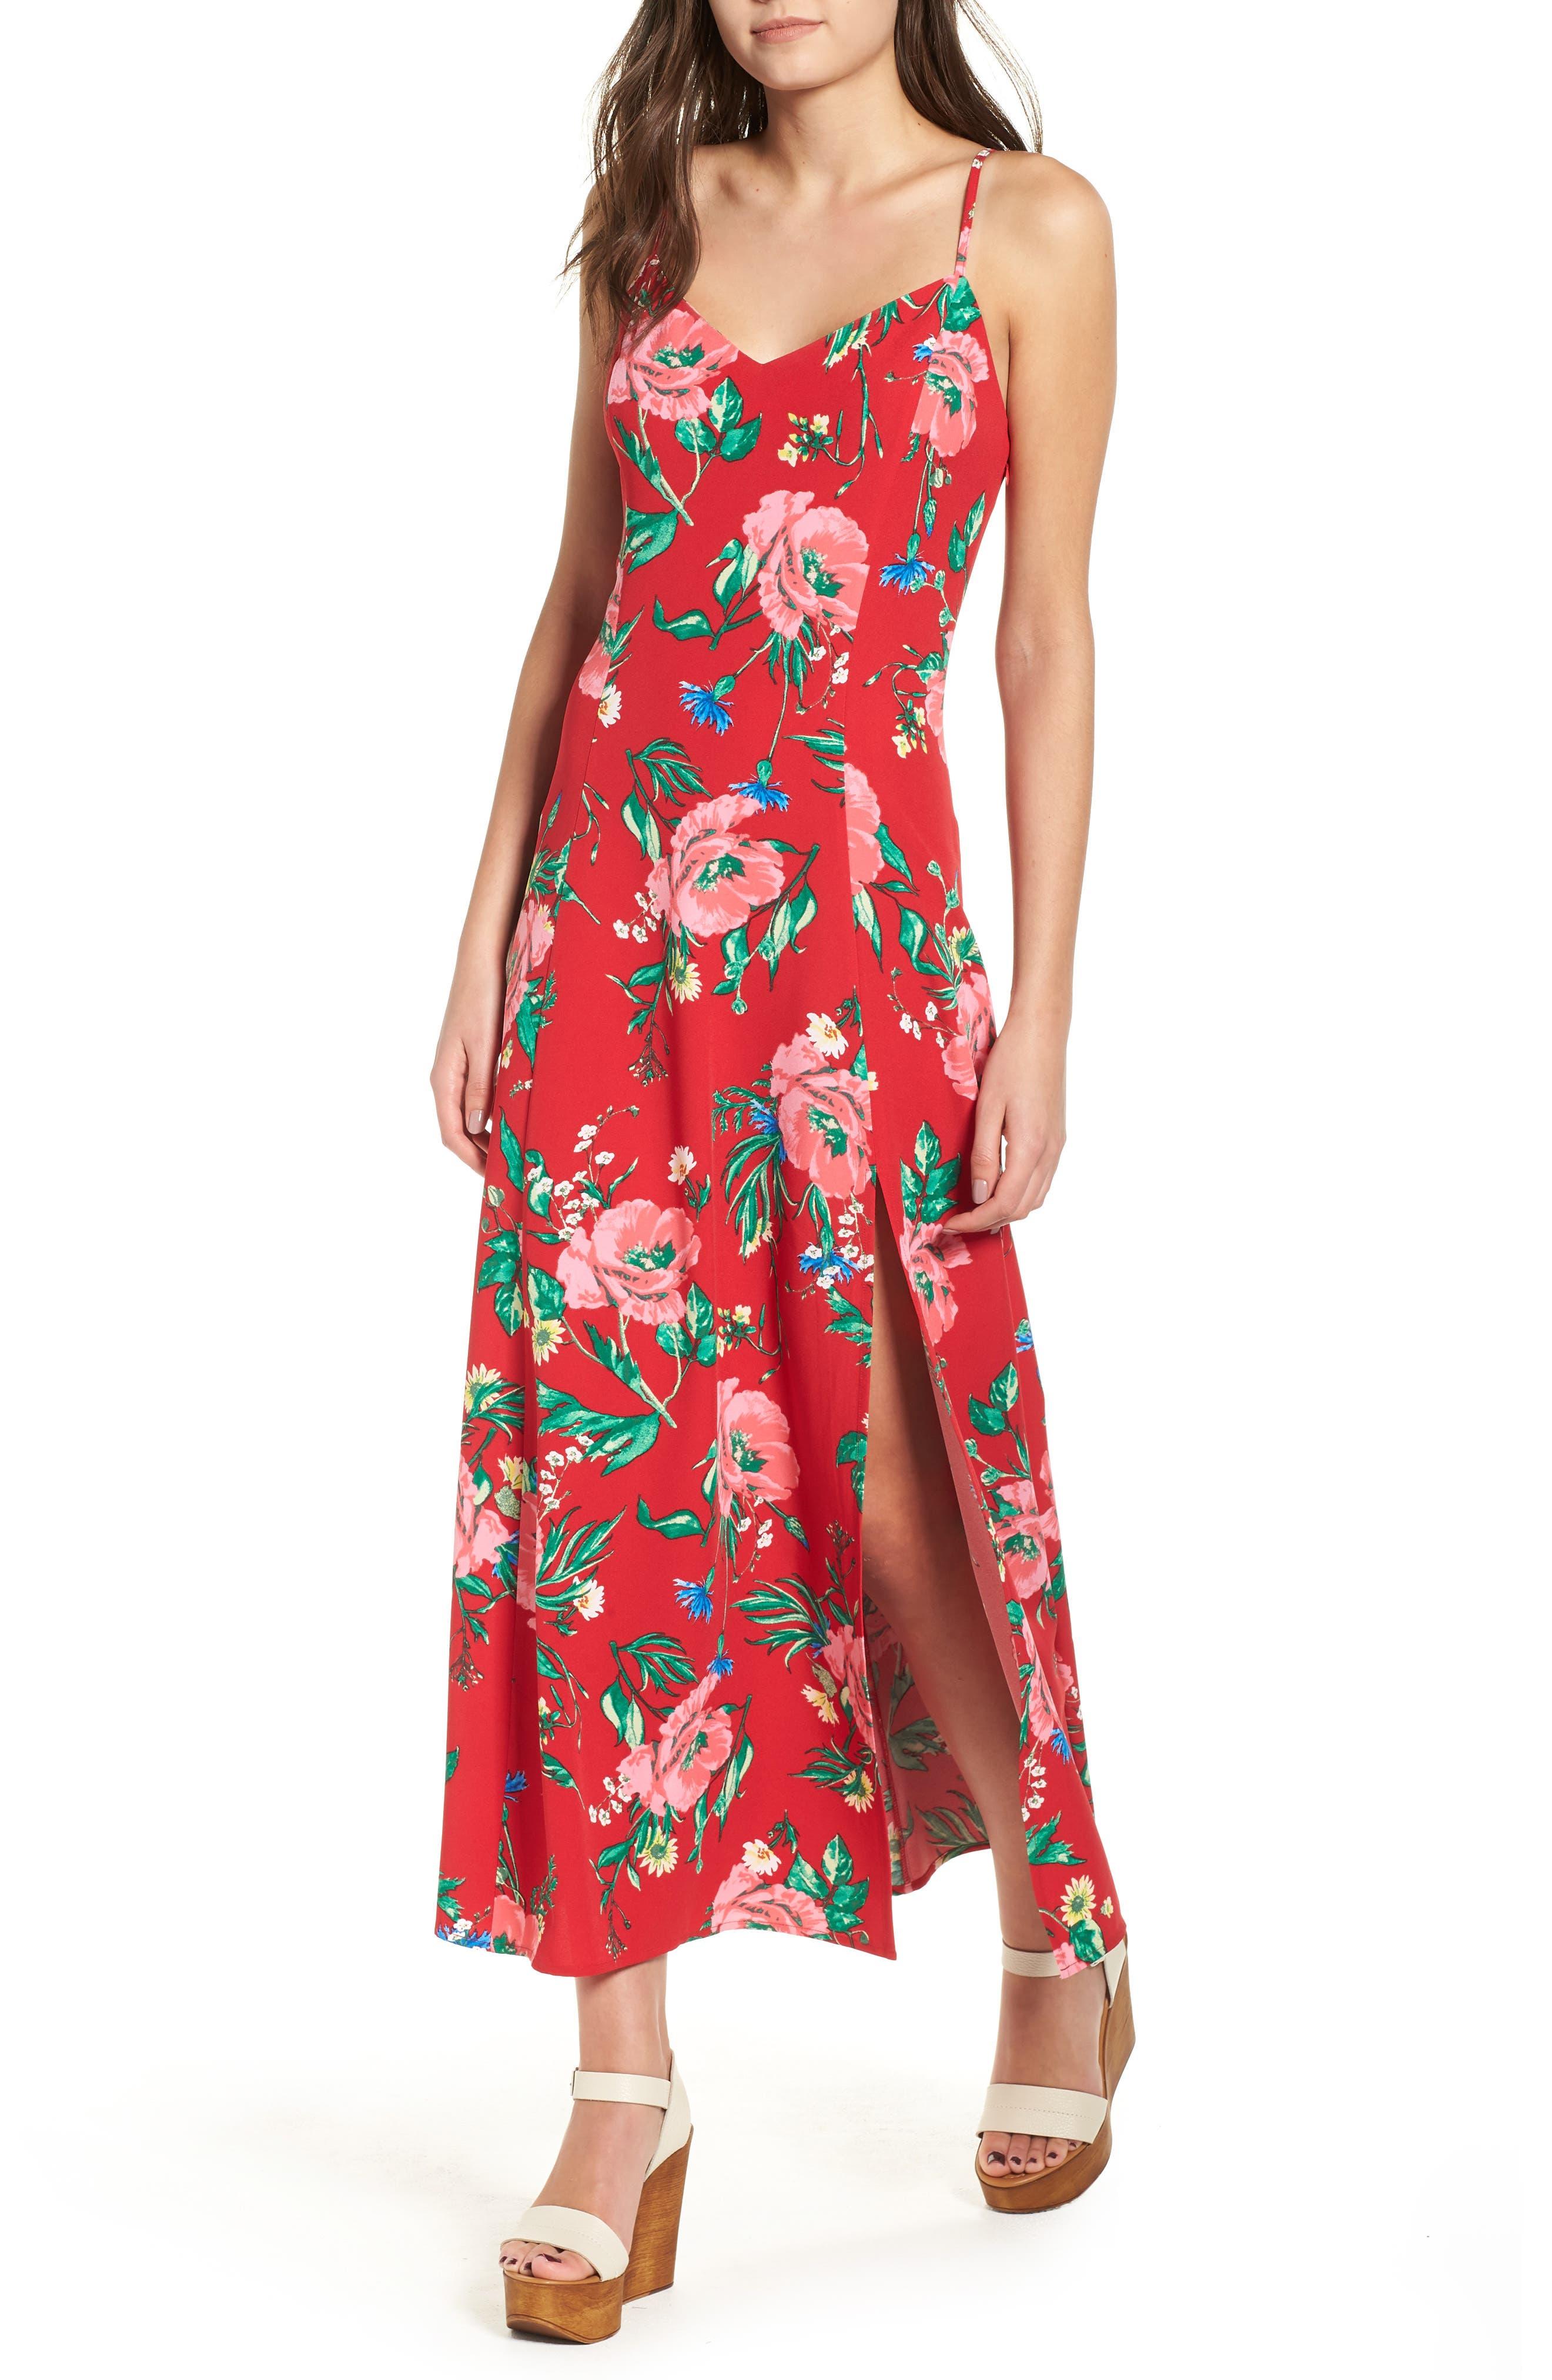 Floral Long Sleeve Wrap Dress - Red blossom print Glamorous OkkNBbB61A